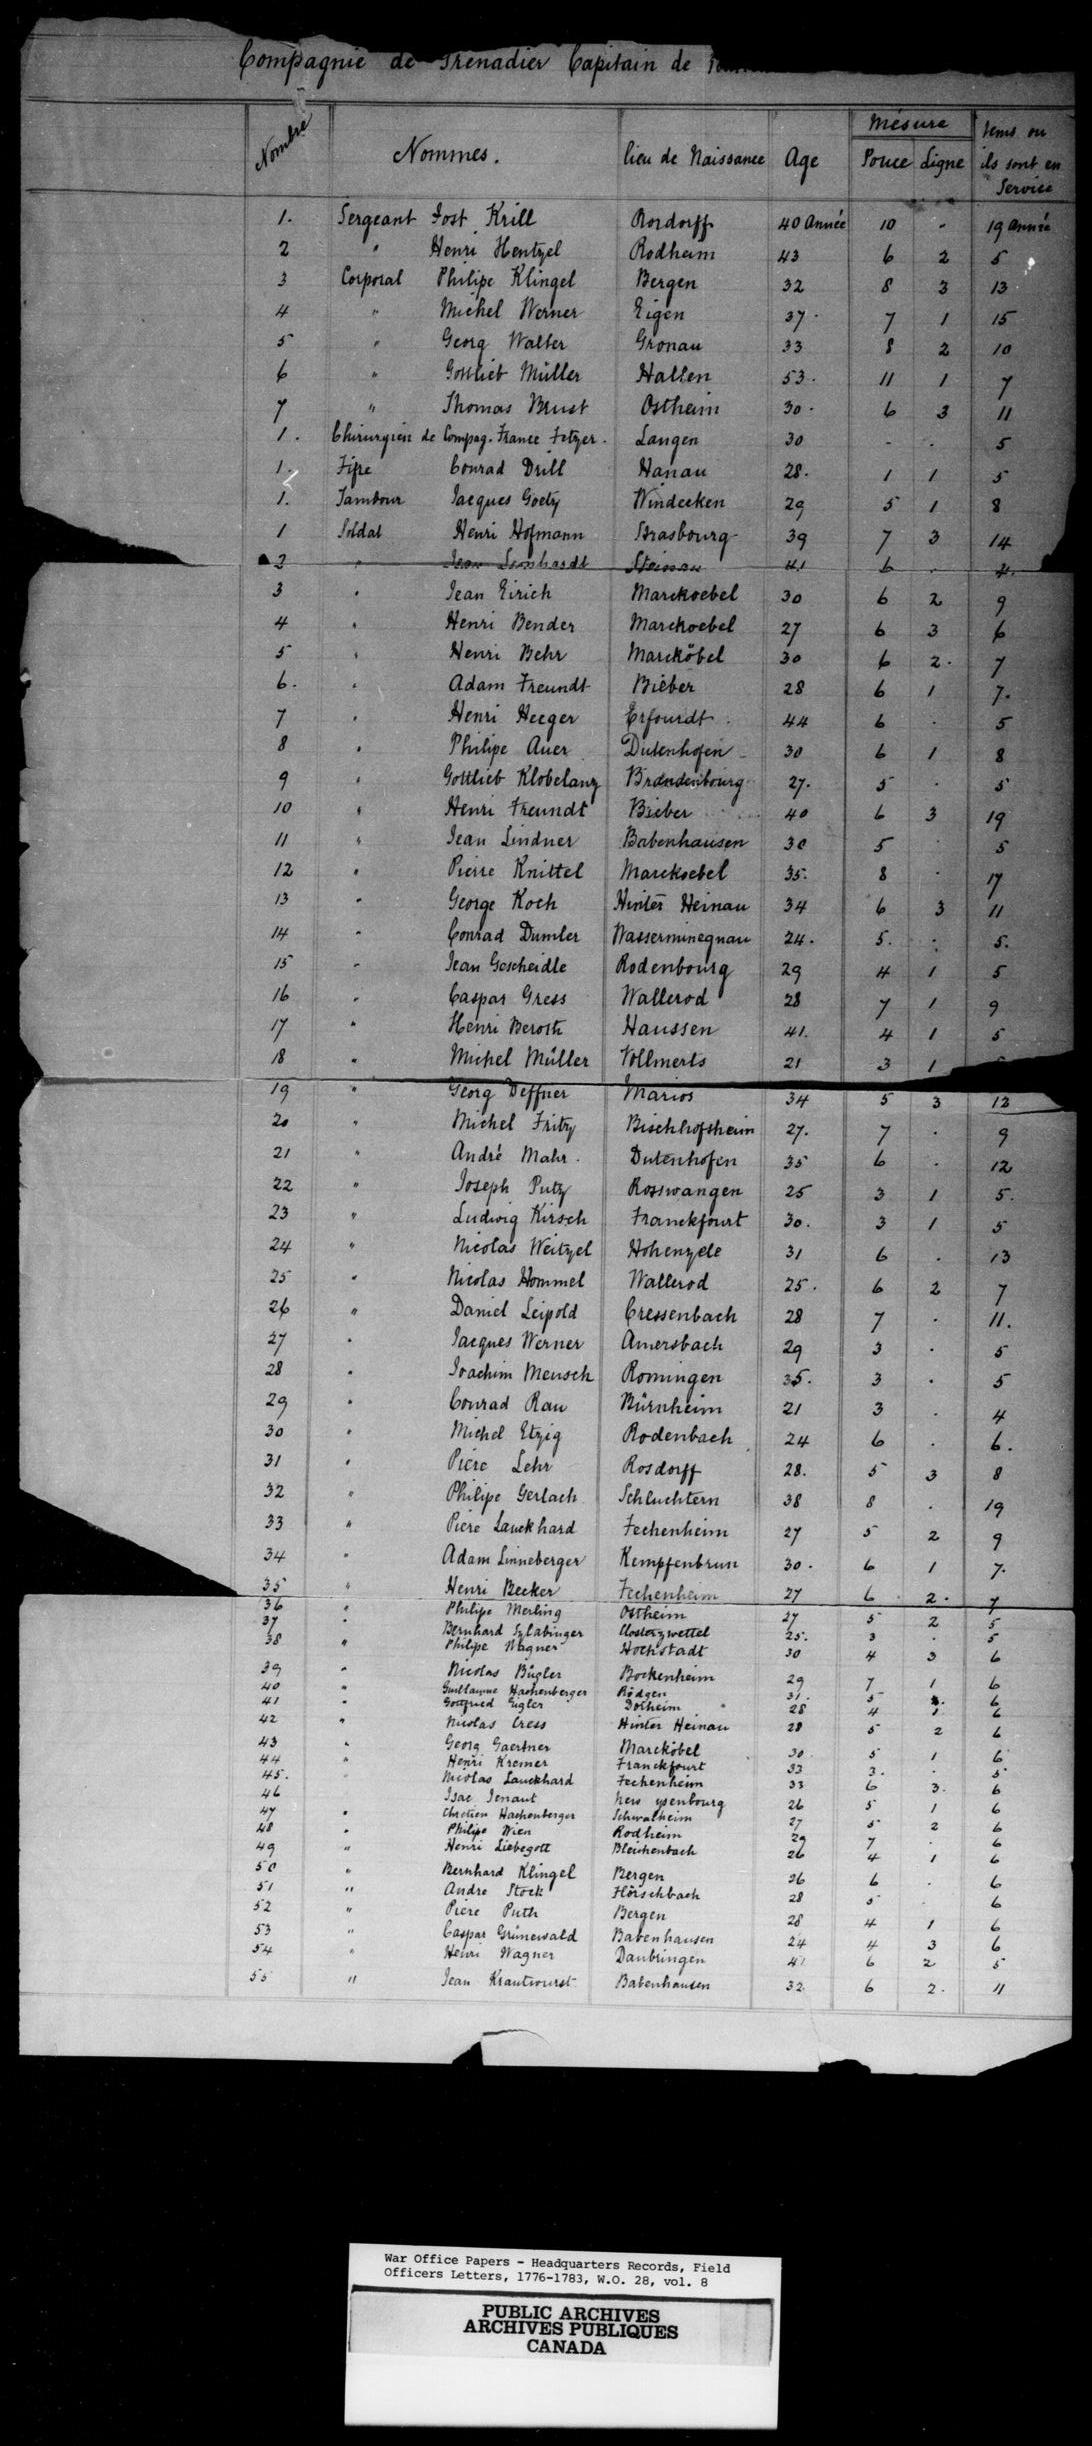 Canada and the German mercenaries of the American Revolution